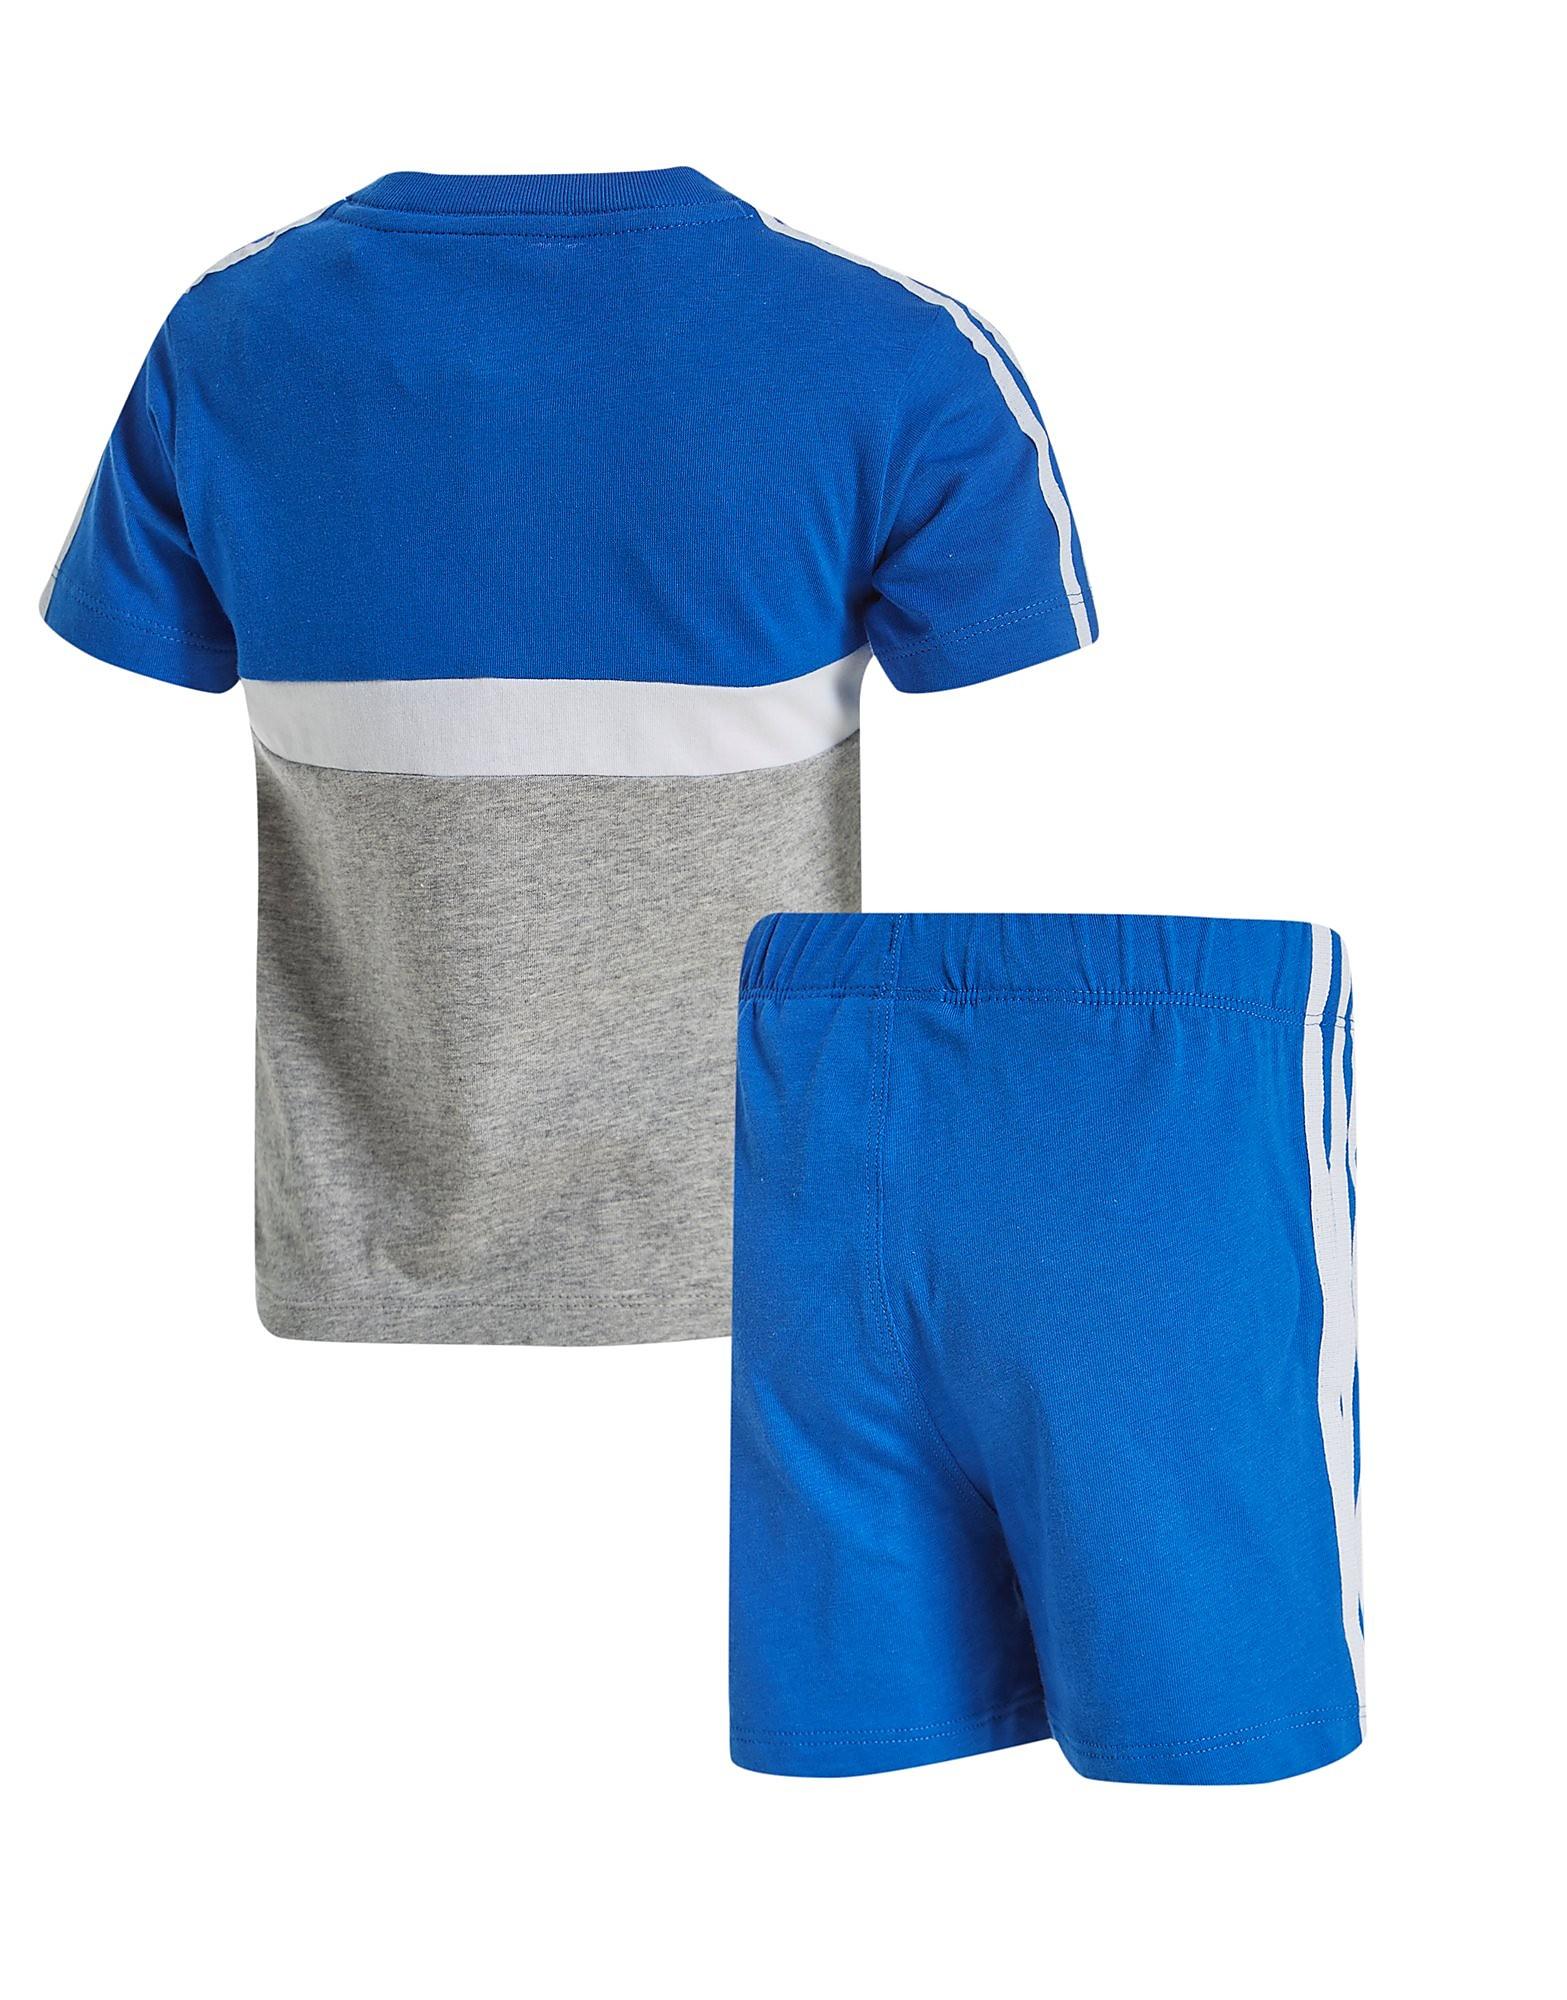 adidas Originals Itasca T-Shirt/Short Set